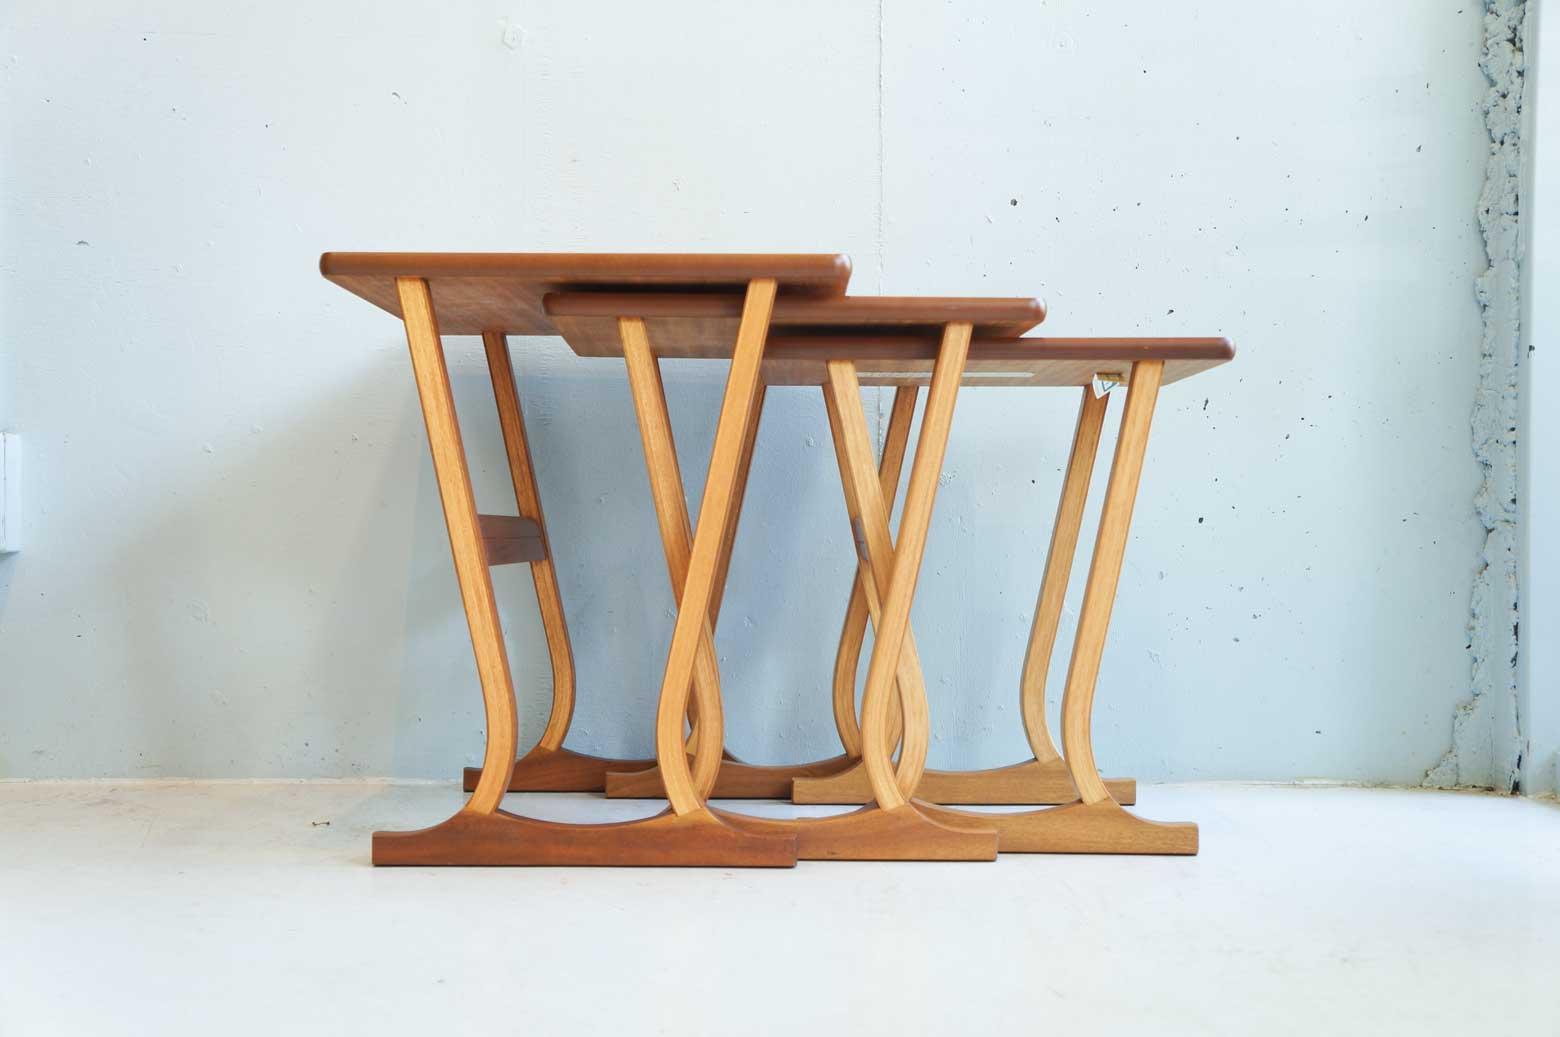 UK Vintage Nathan Nest Table/イギリス ヴィンテージ ネイサン ネストテーブル